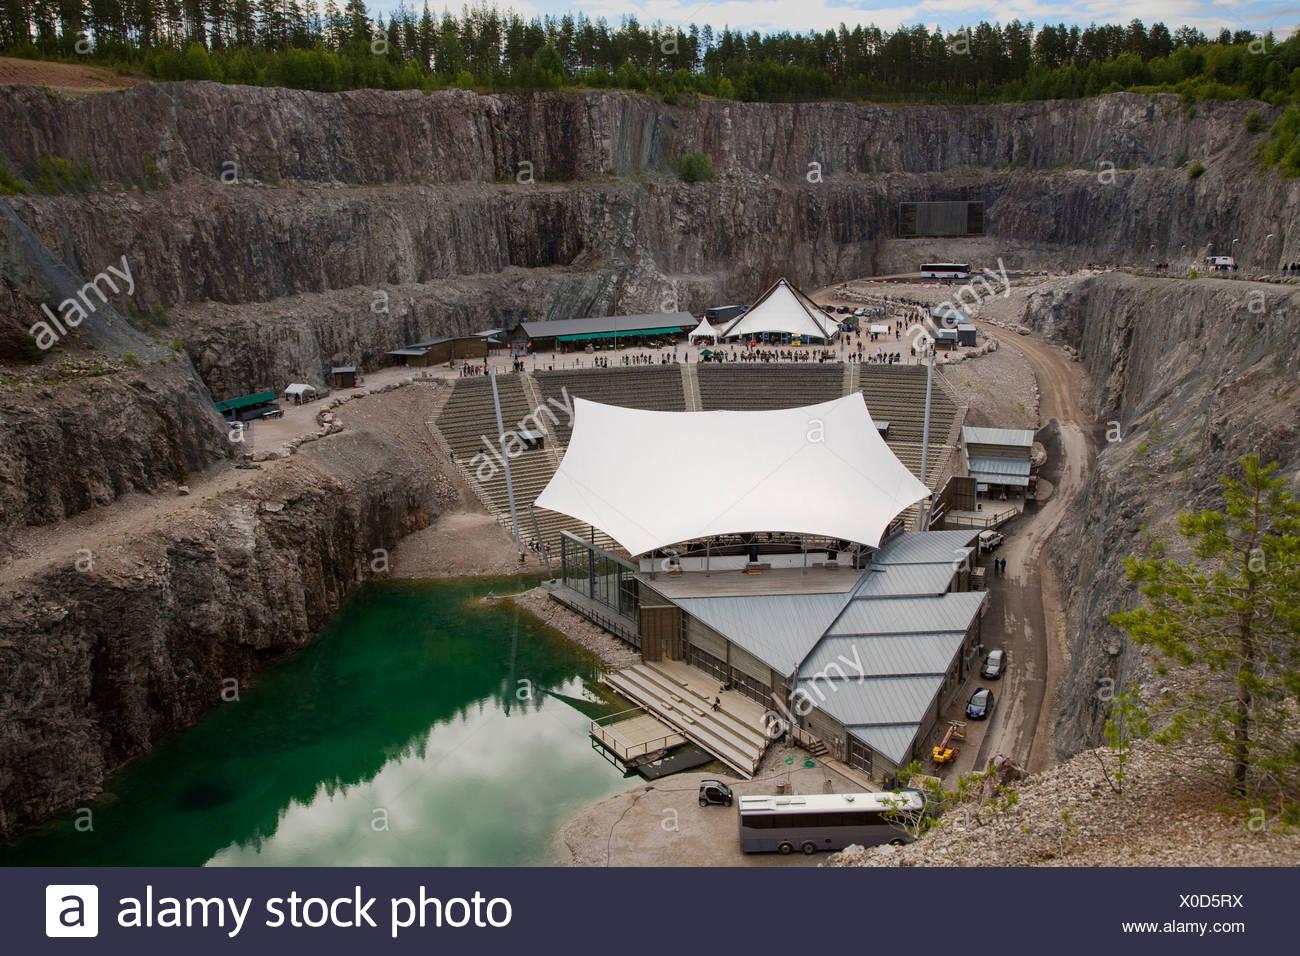 Dalhalla opera stage in Dalarna cliffs at Sweden - Stock Image